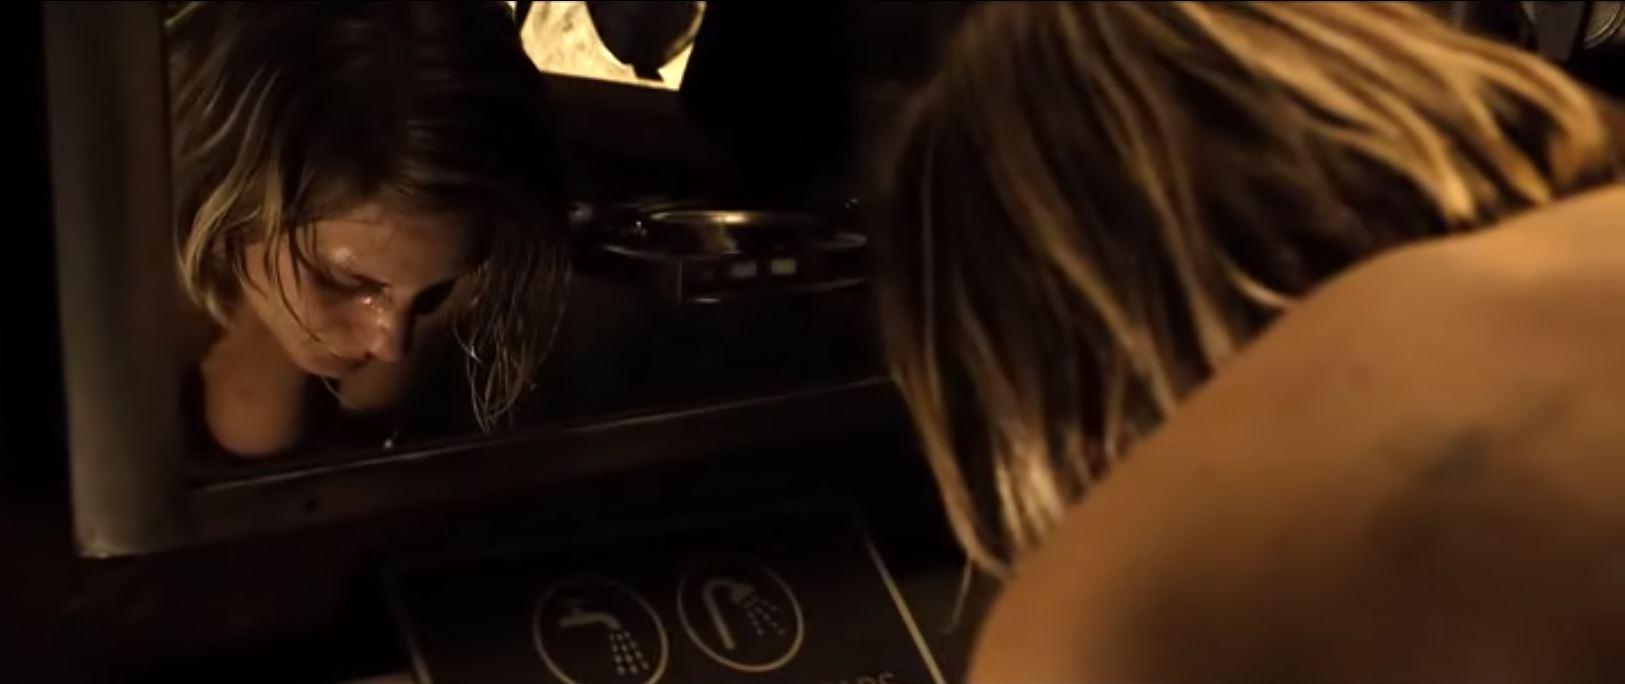 Katee Sackhoff bending over topless in Riddick